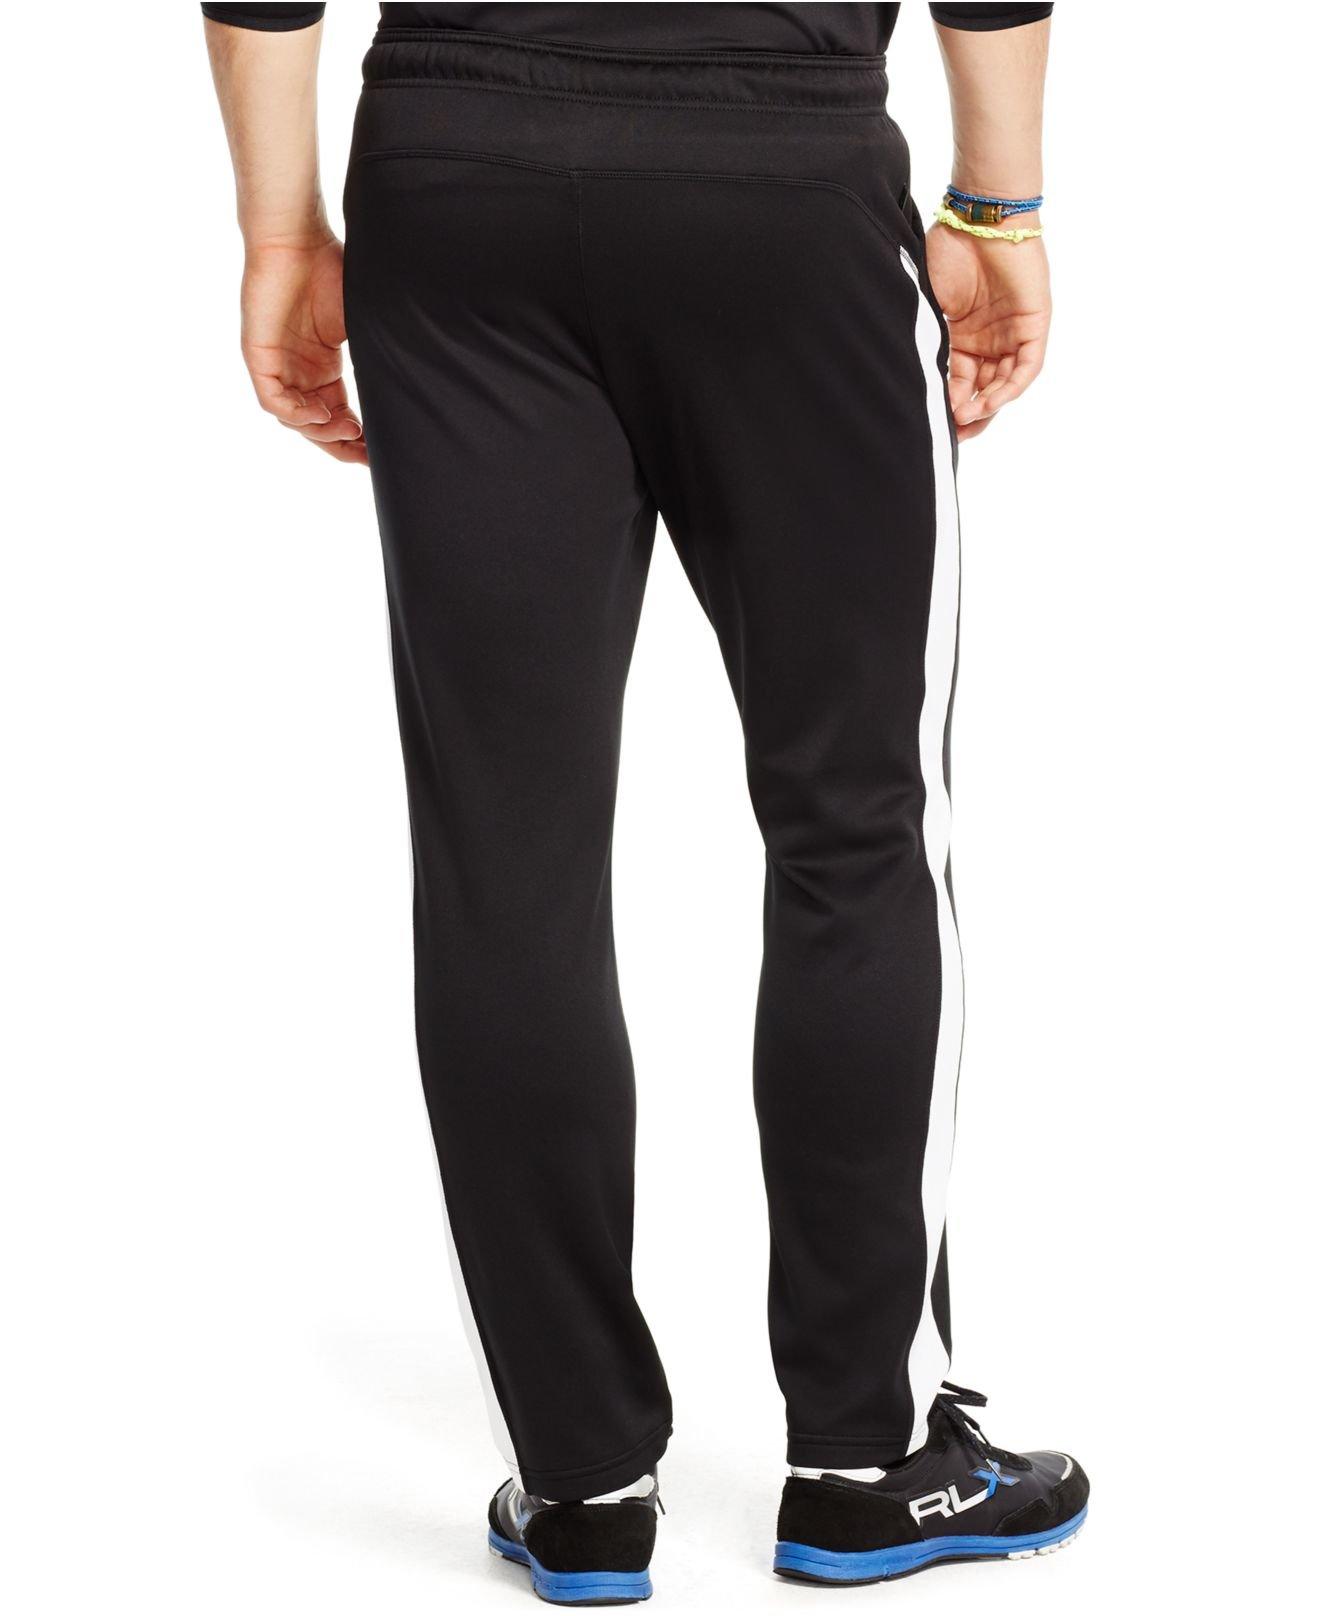 191f39491d4e Lyst - Polo Ralph Lauren Tech Fleece Pants in Black for Men